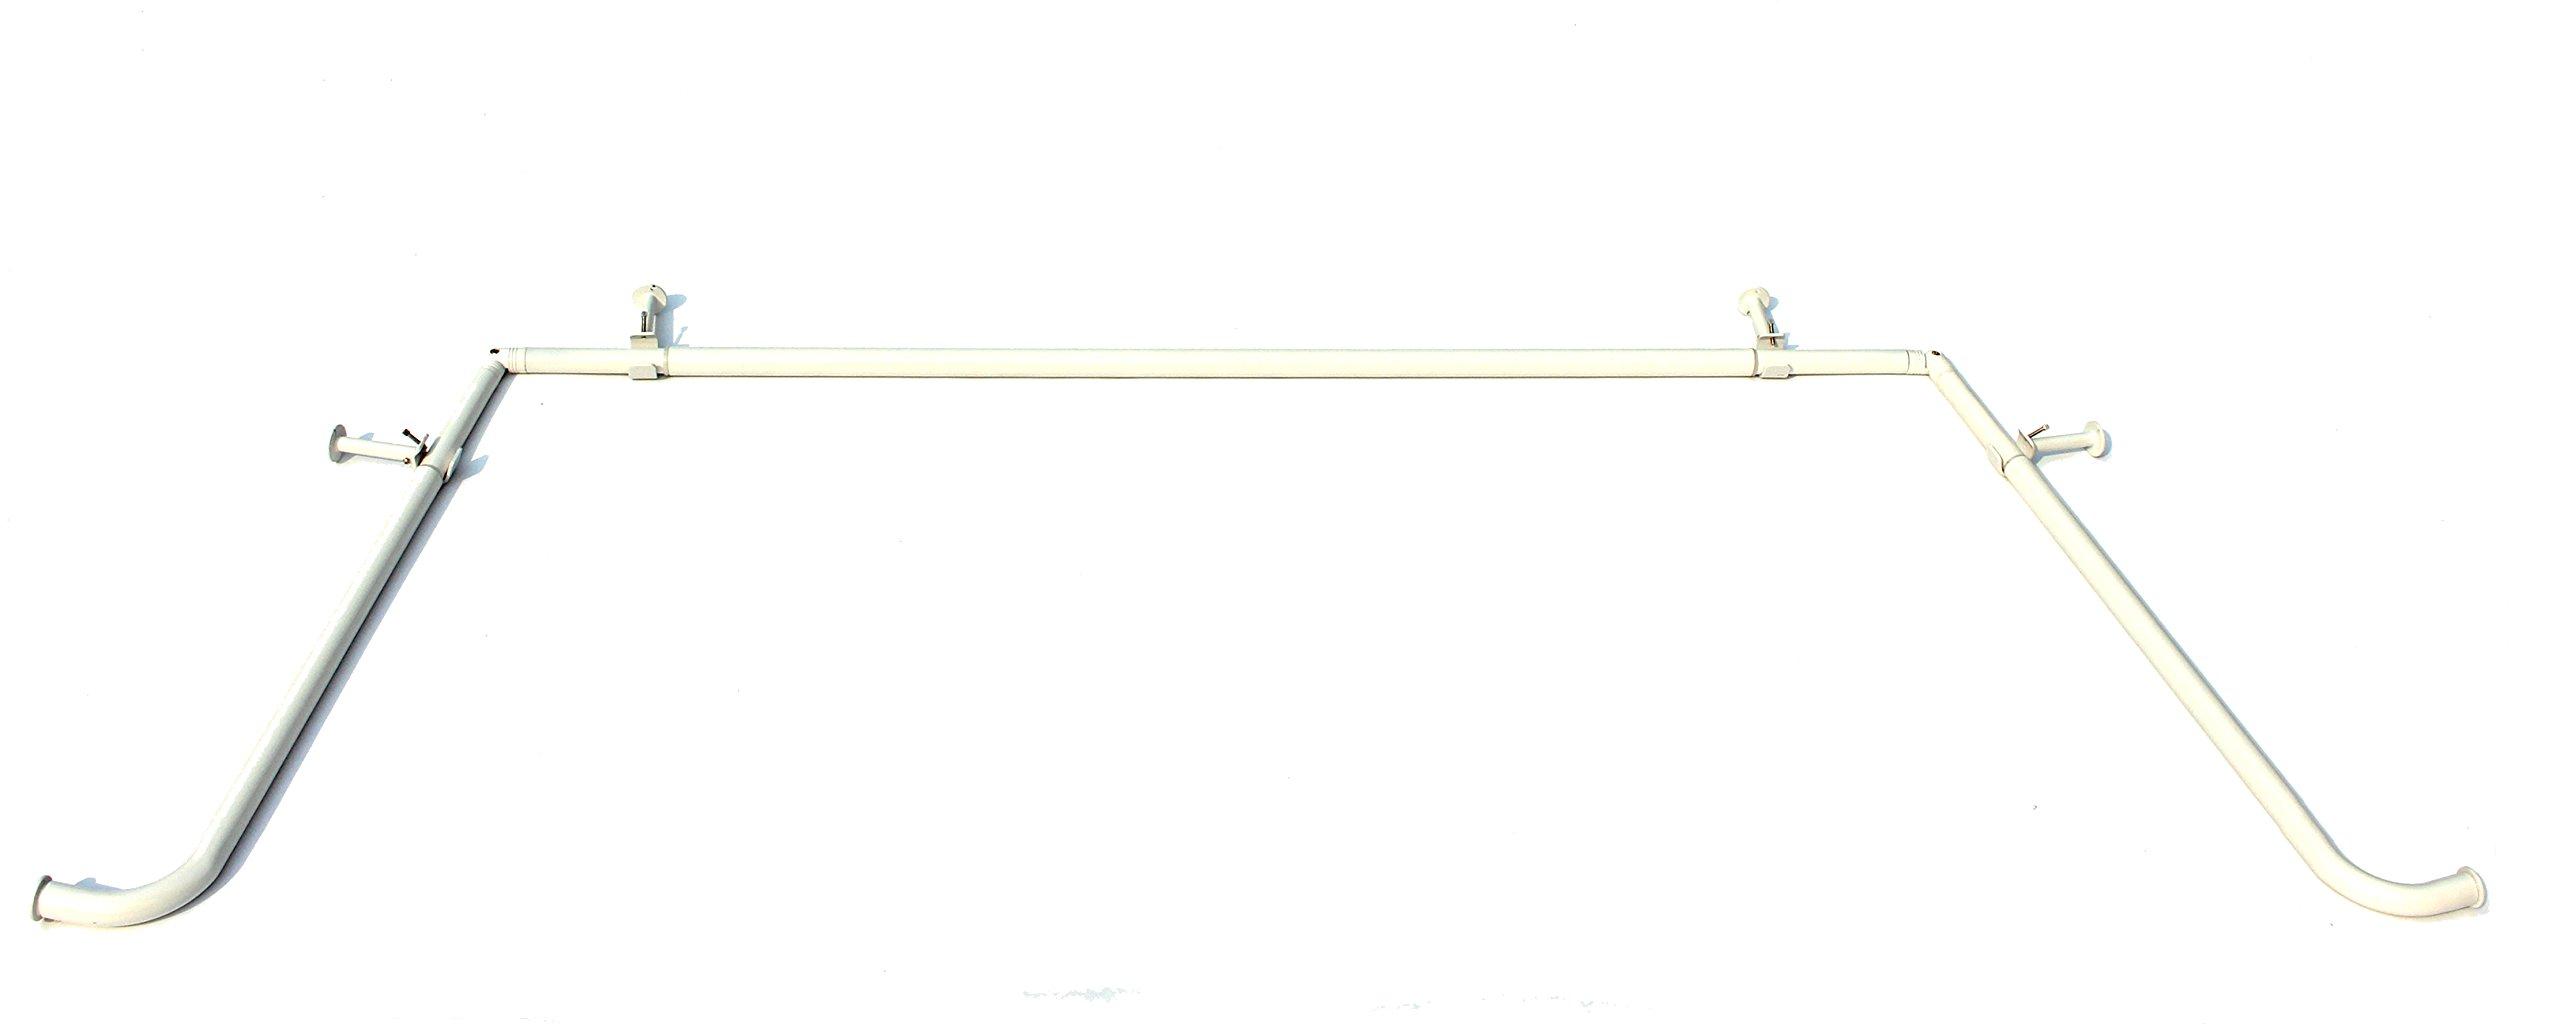 Urbanest Glossy White Bay Window Curtain Rod Set, 1-inch